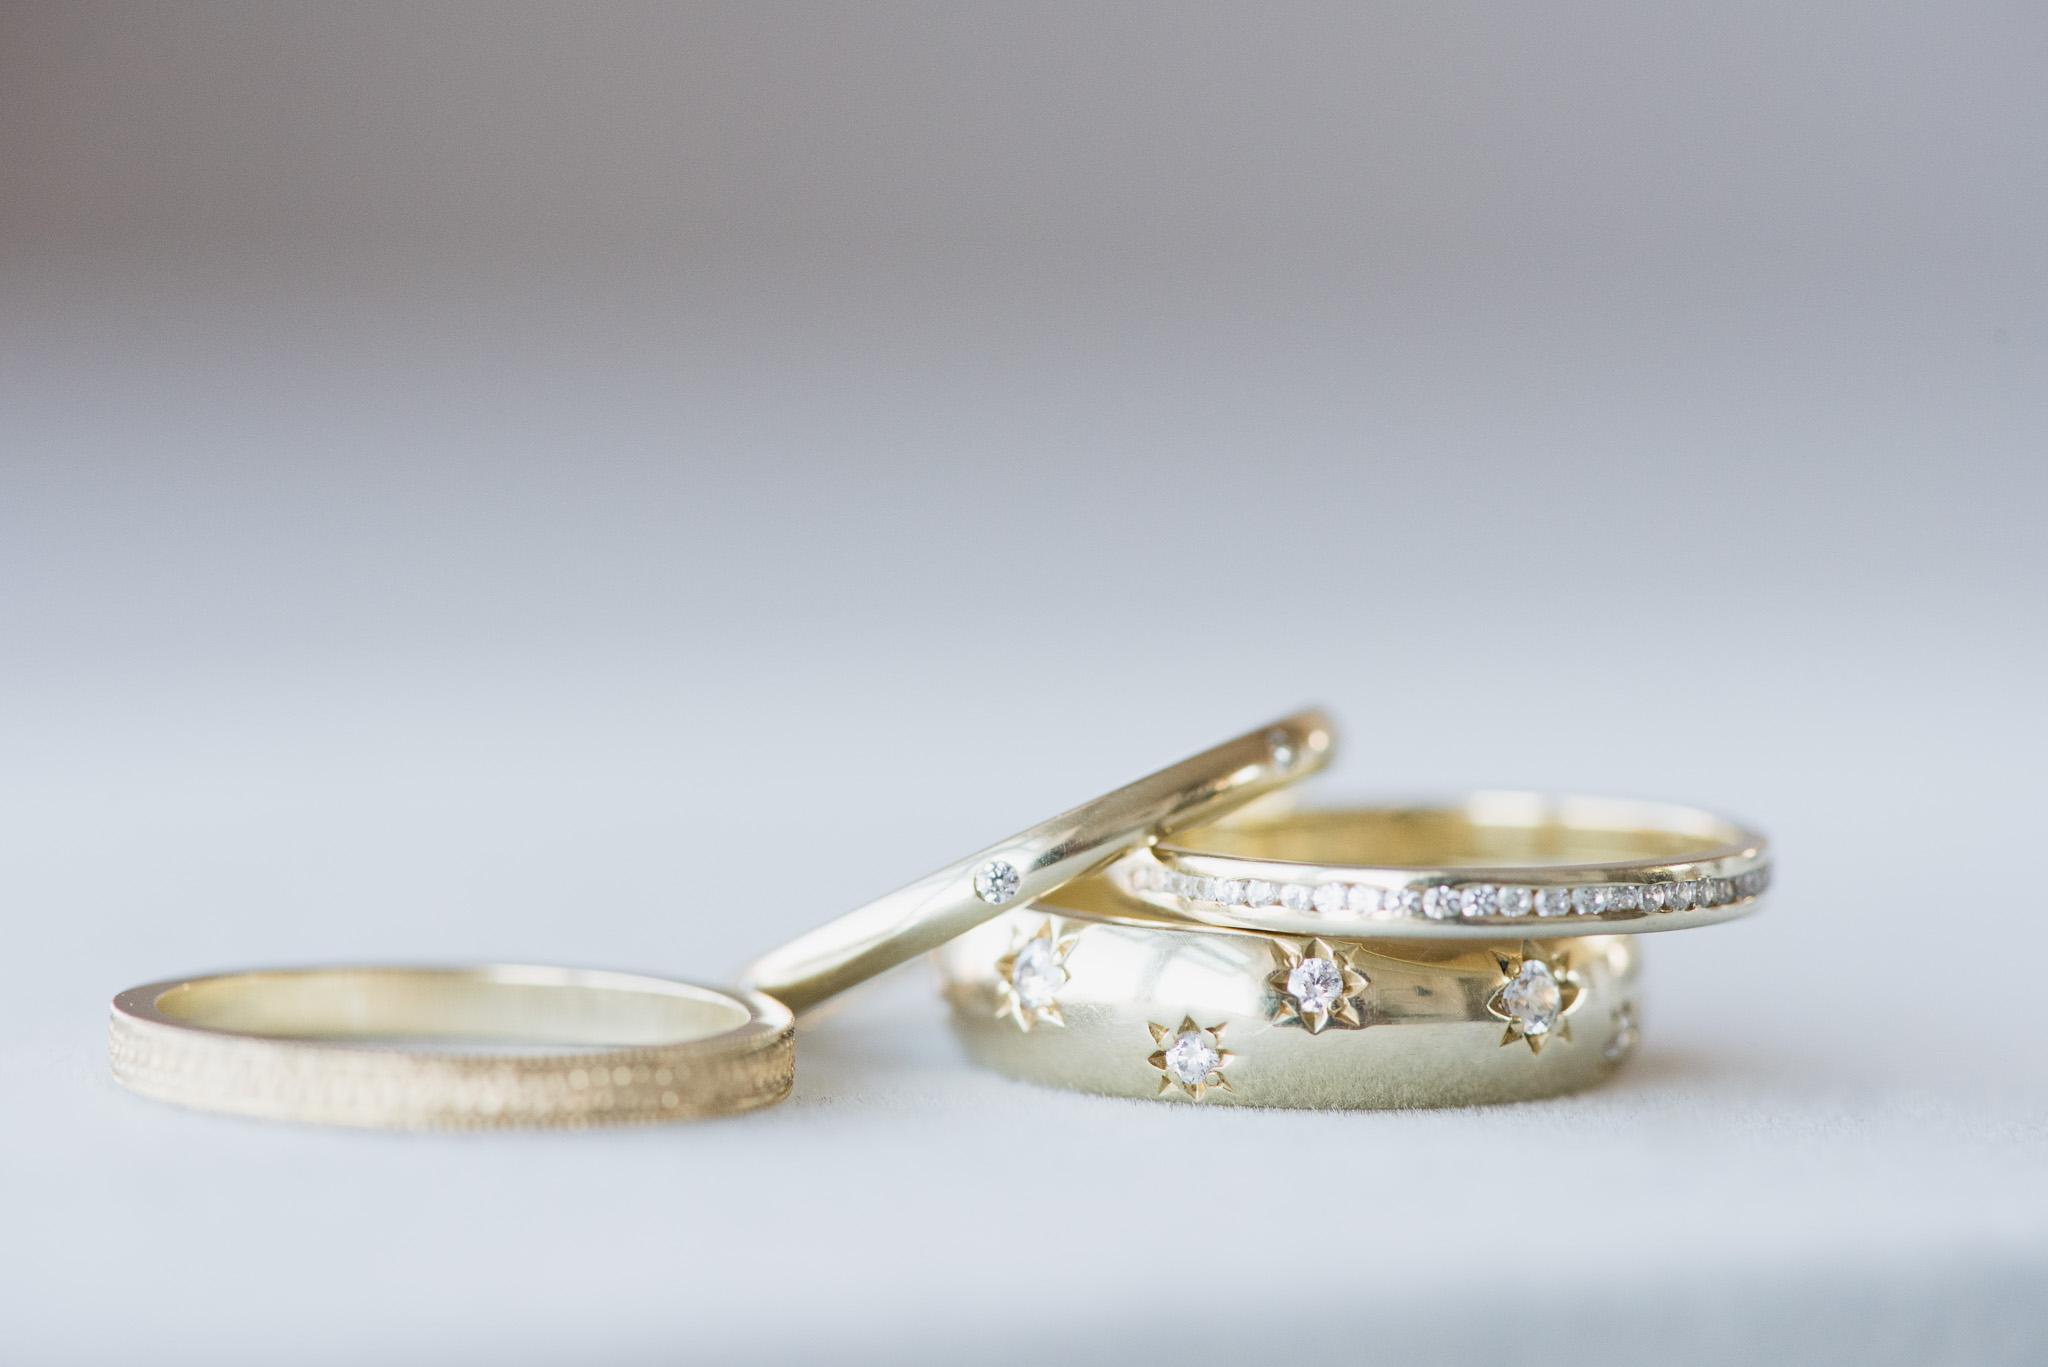 Arabel_Lebrusan_Jewellery_Emma_Hare_Photography__Ethical_Engagement_Rings-21.jpg